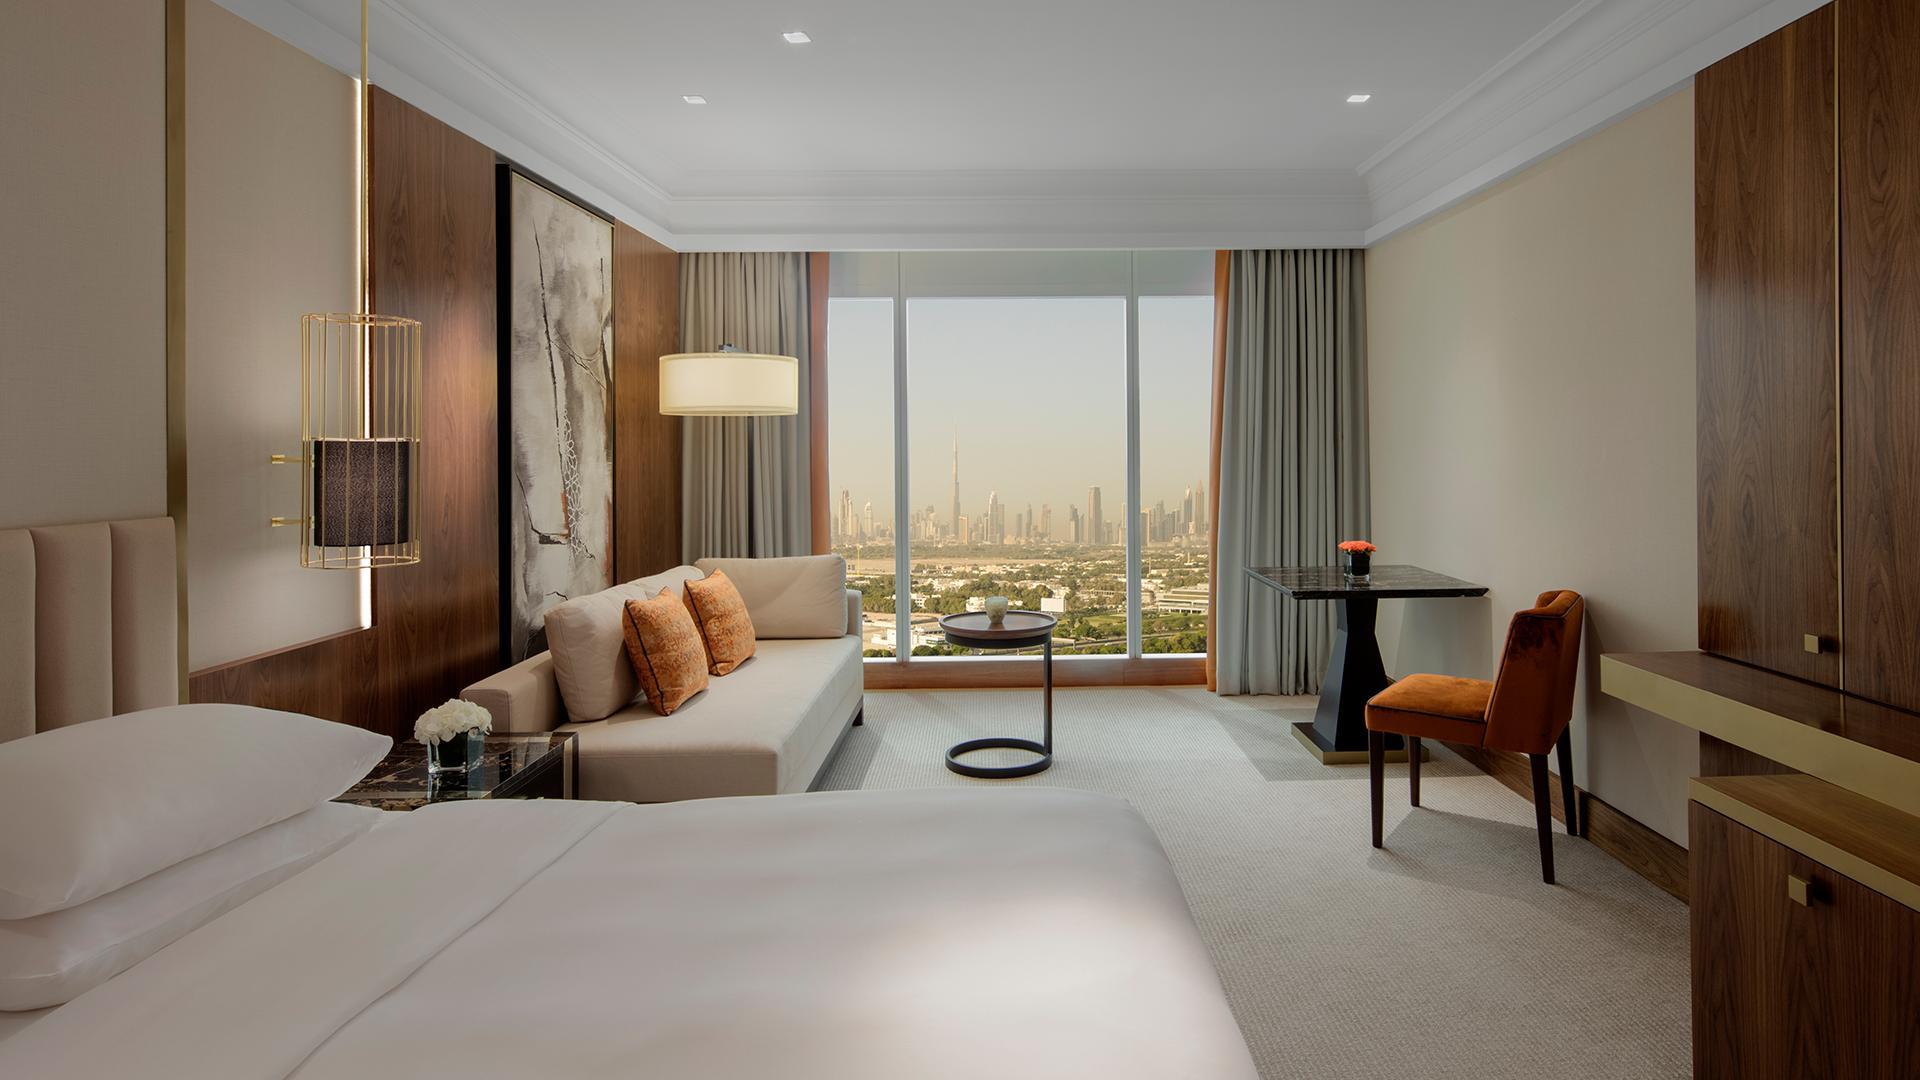 1 King Bed with Club Access image 1 at Grand Hyatt Dubai by null, Dubai, United Arab Emirates